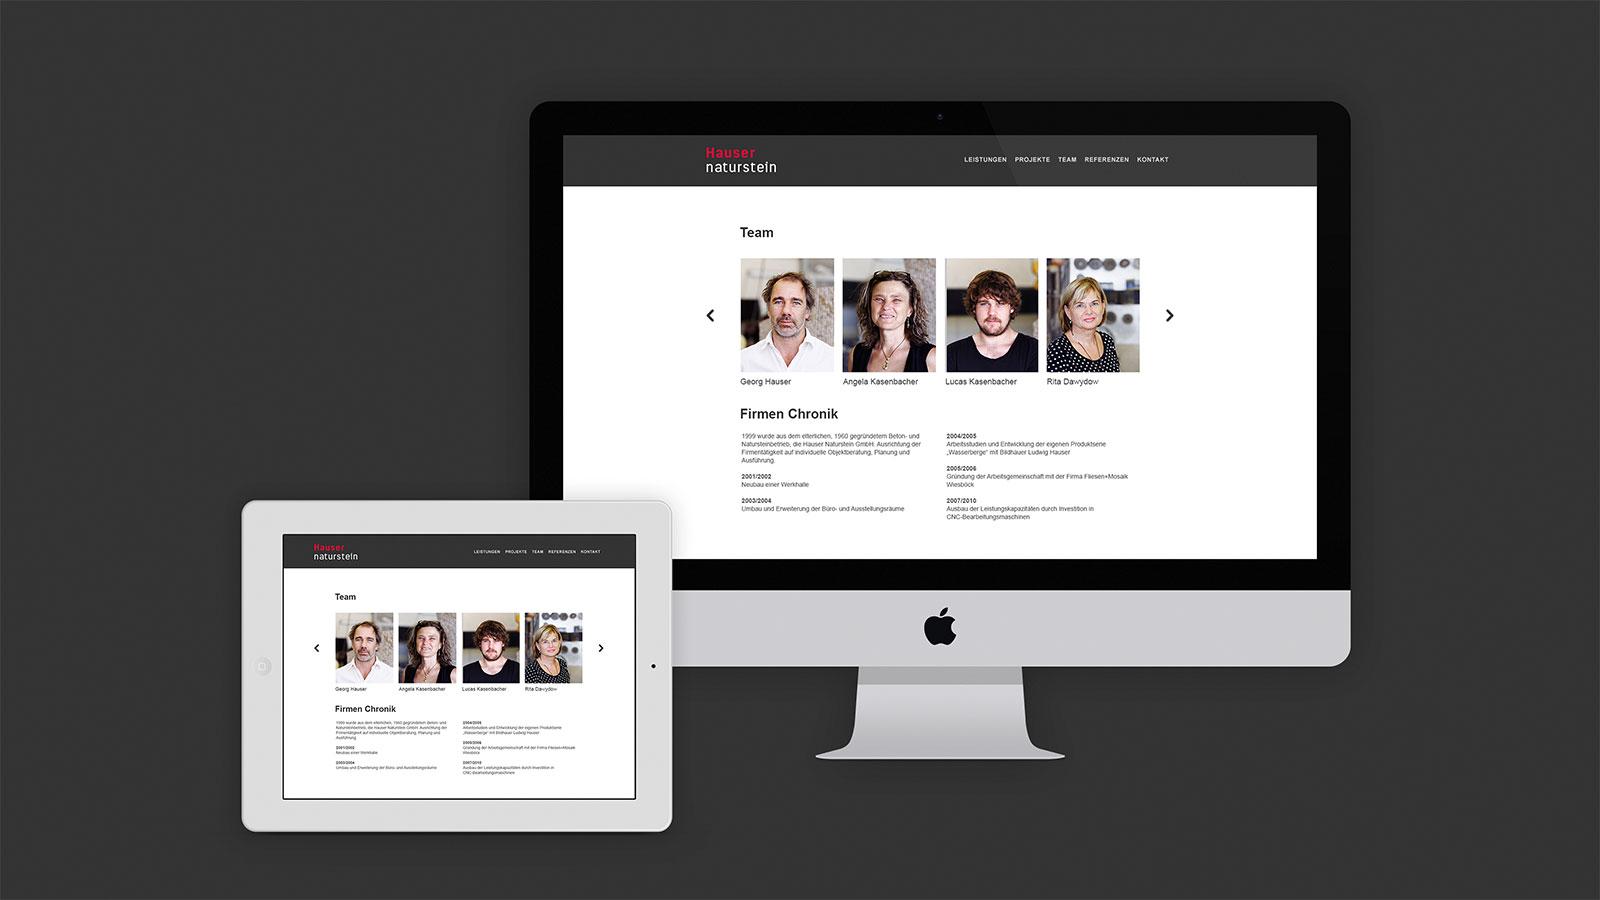 hauser-homepage-5